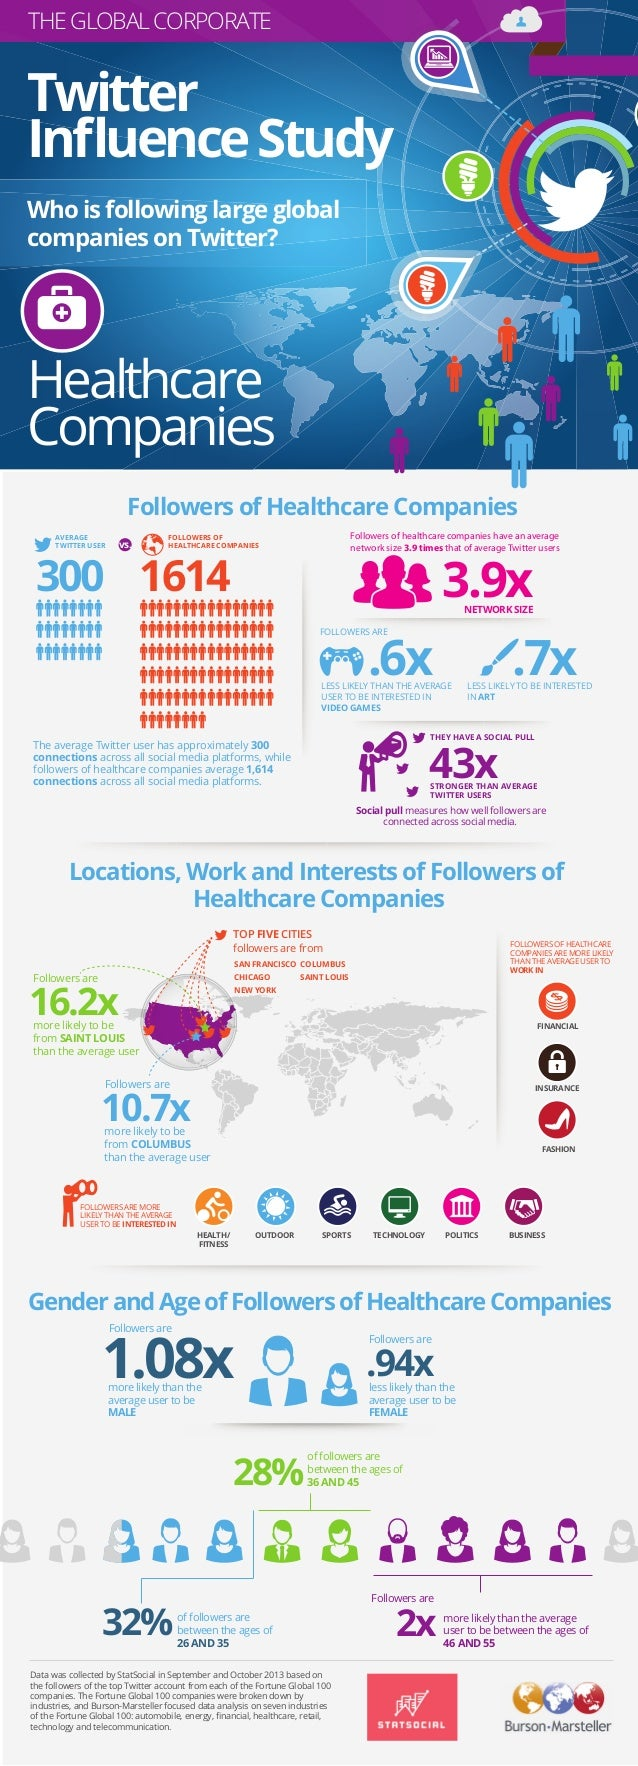 Burson-Marsteller Global Corporate Twitter Influence Study: Healthcare Companies